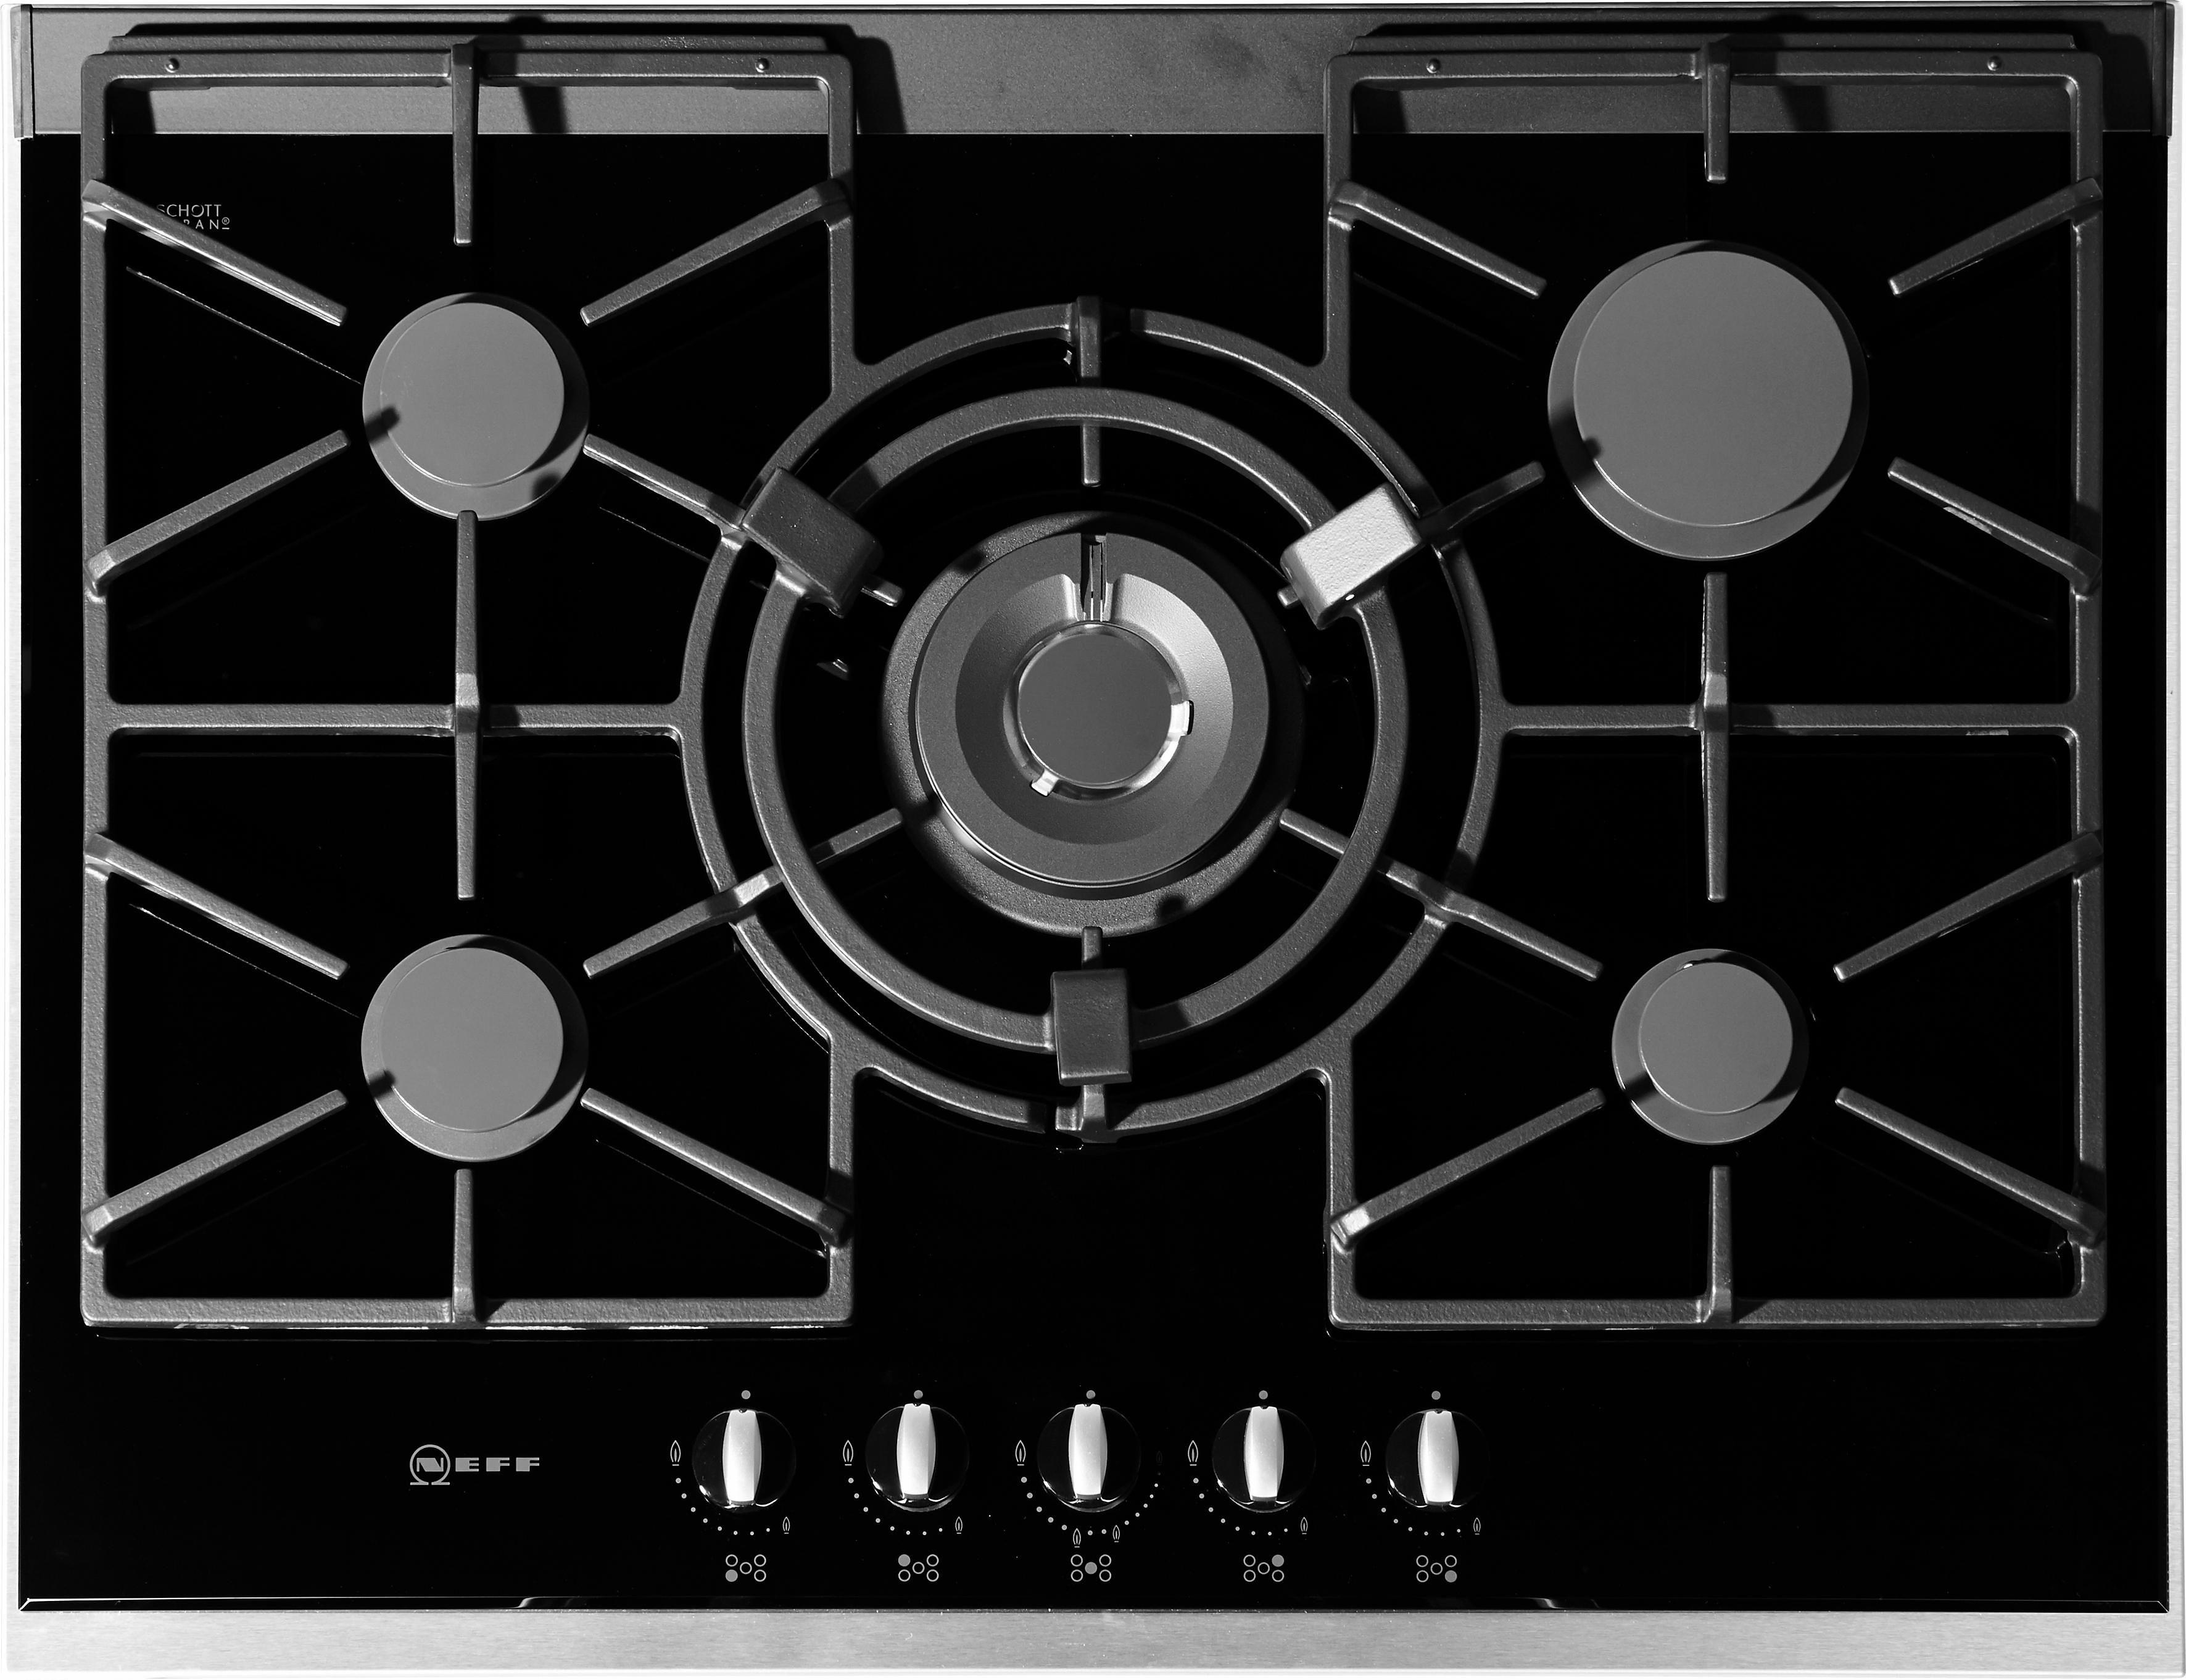 Neff Autarkes Gas-Glaskeramik-Kochfeld TS 6776 N / T67S76N1, mit integr. Kochstellenreglern